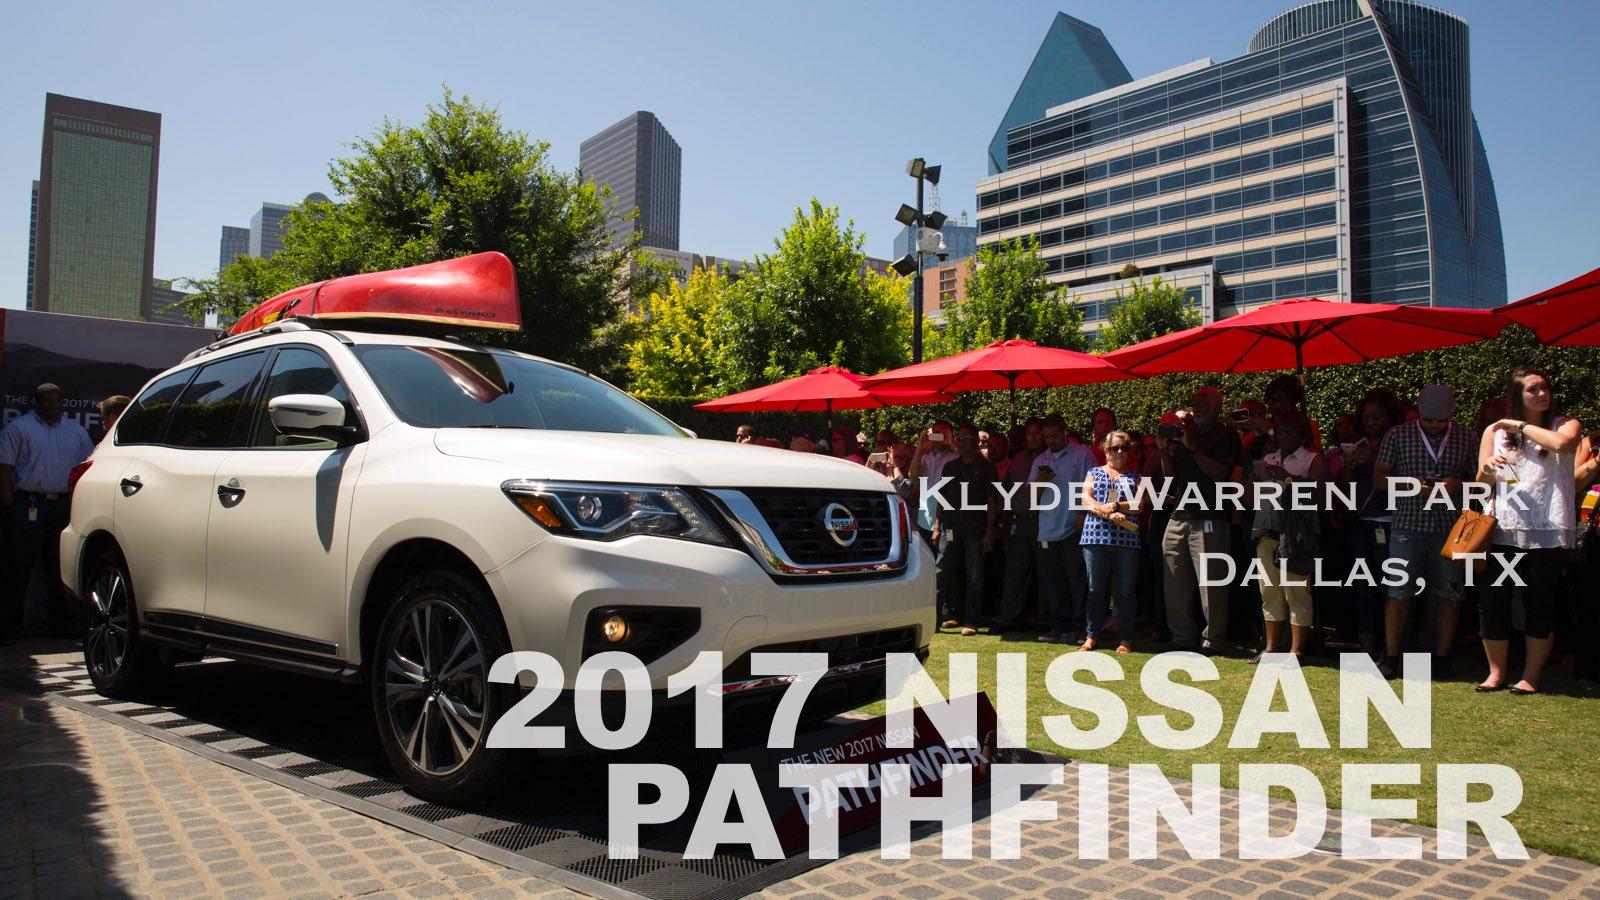 Nissan S New Pathfinder Debuts In Dallas While Dallas